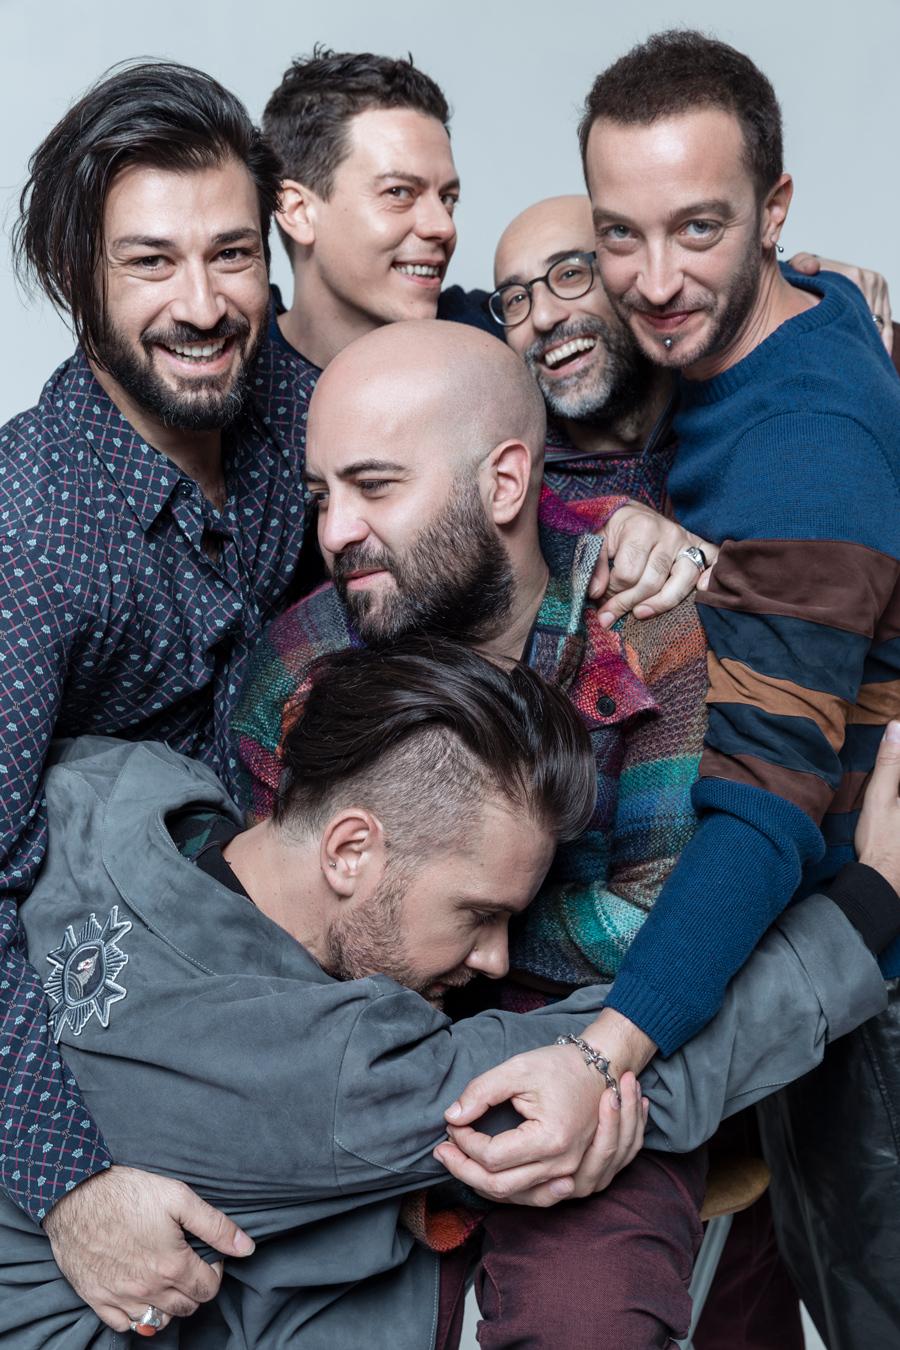 Band negramaro - La finestra album ...